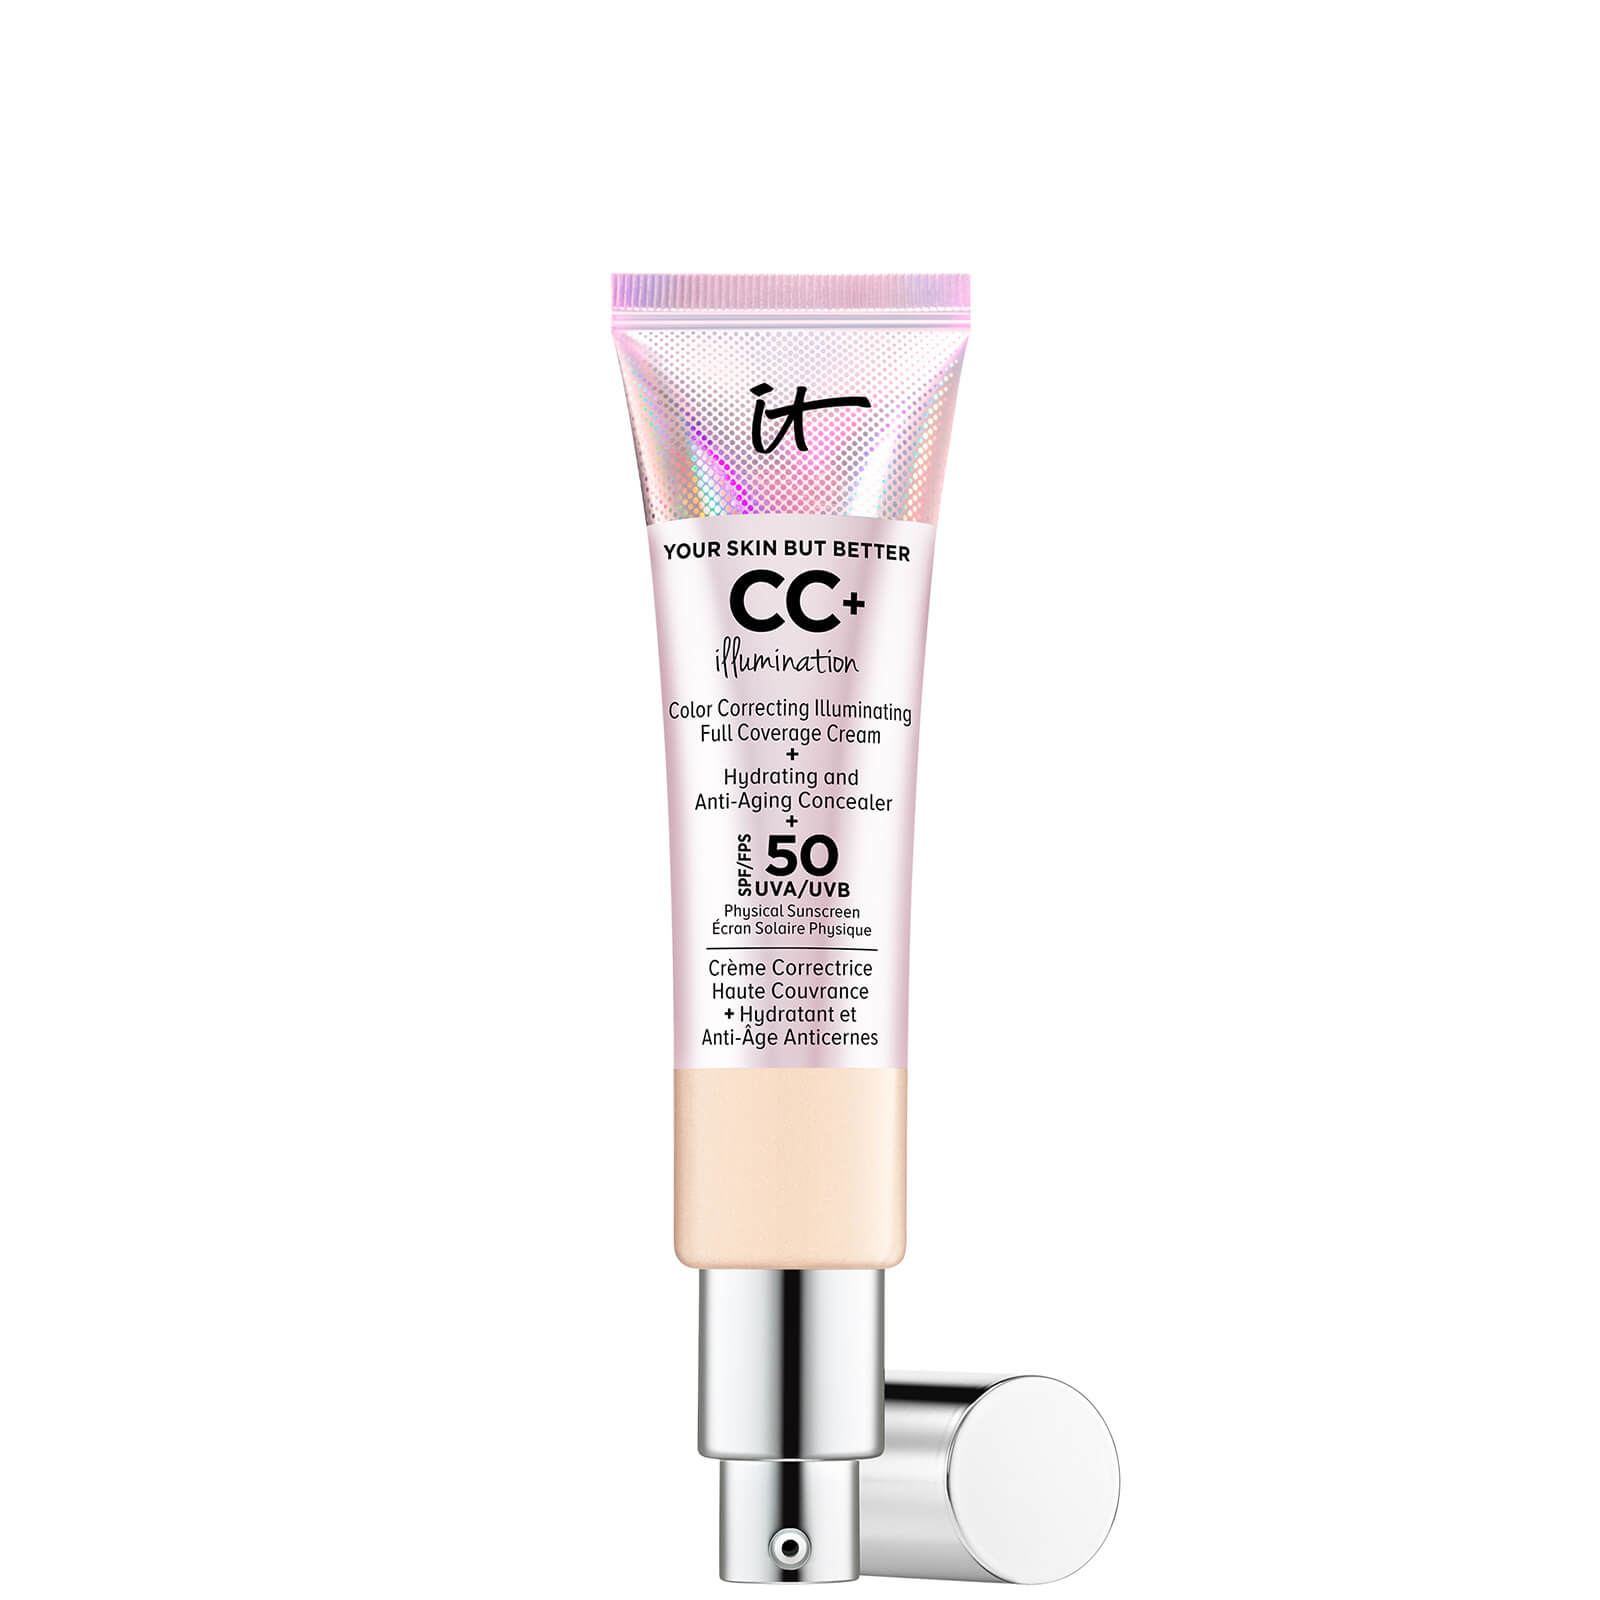 Купить IT Cosmetics Your Skin But Better CC+ Illumination SPF50 32ml (Various Shades) - Light